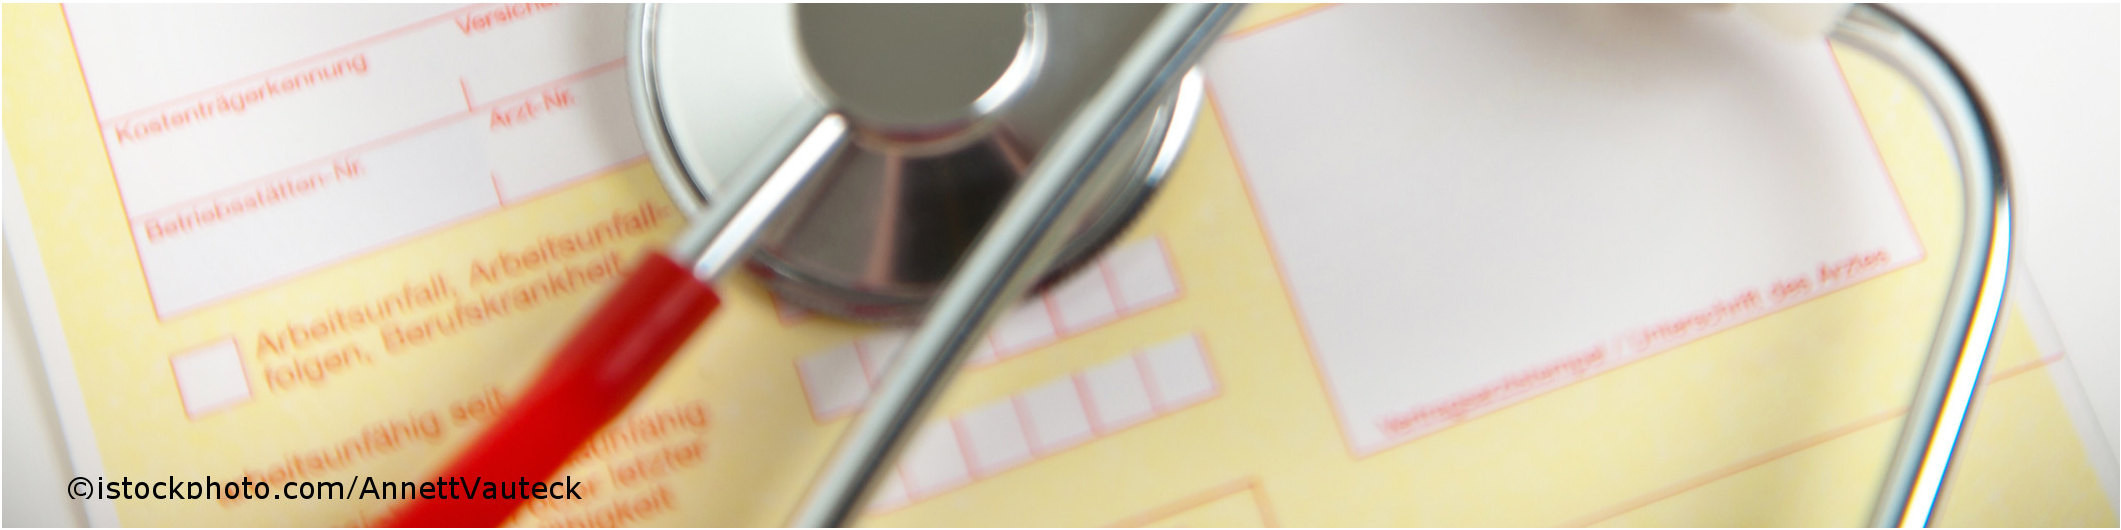 B06 bedeutet im ICD-10 Diagnoseschlüssel Röteln.